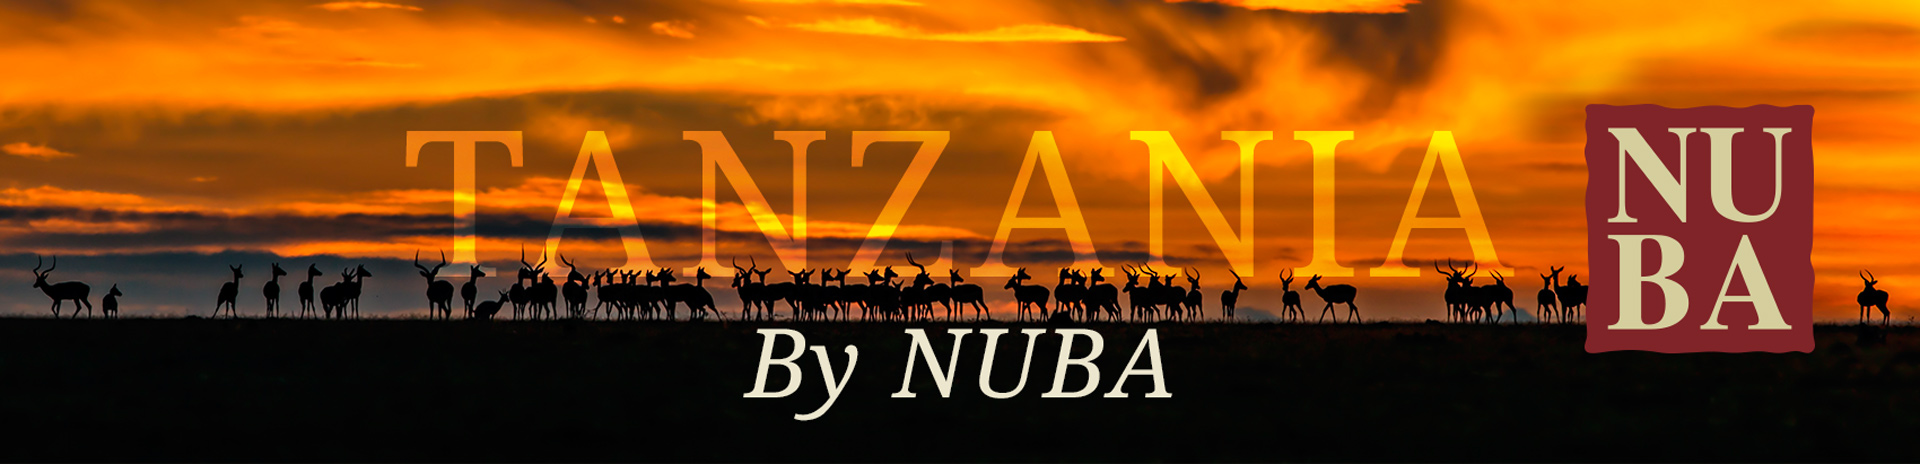 Cabecera Tanzania by NUBA